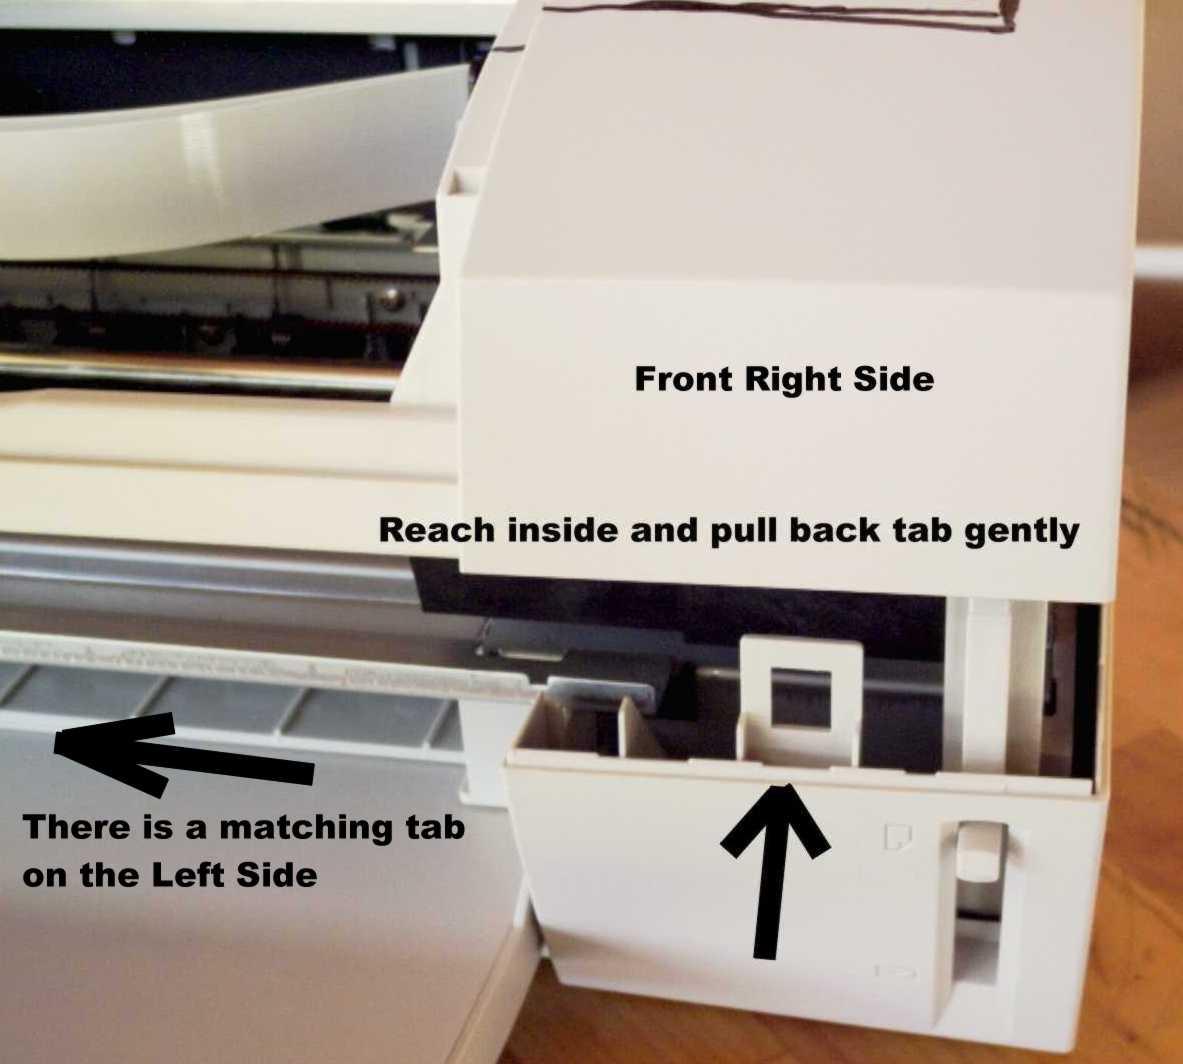 canon pixma mg2520 printer manual